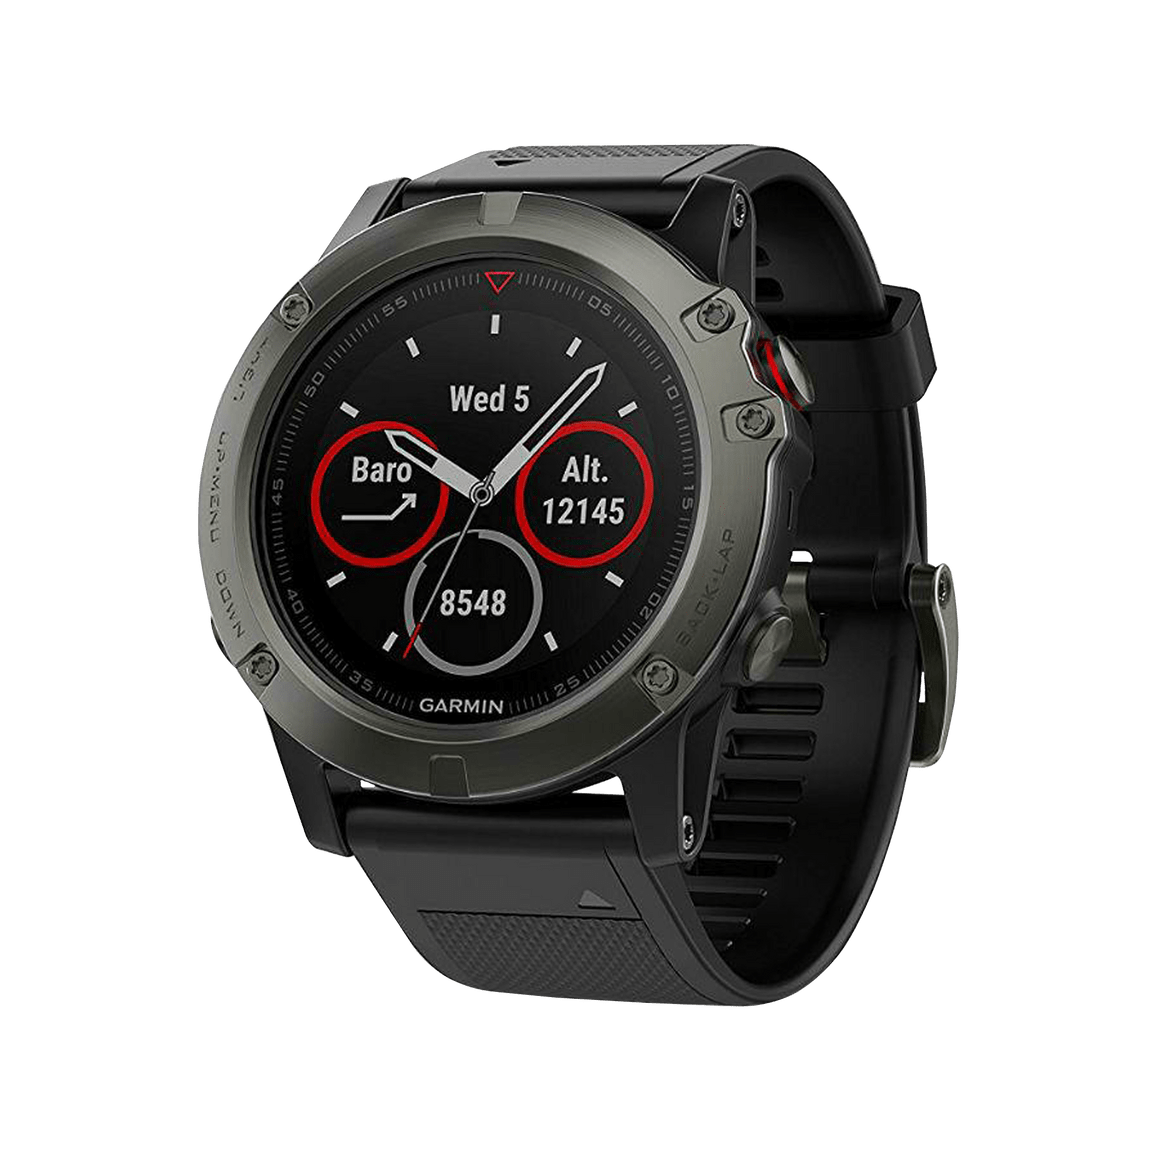 deed31e6860d Monitor GPS Garmin Multideporte fénix 5X Zafiro - martimx